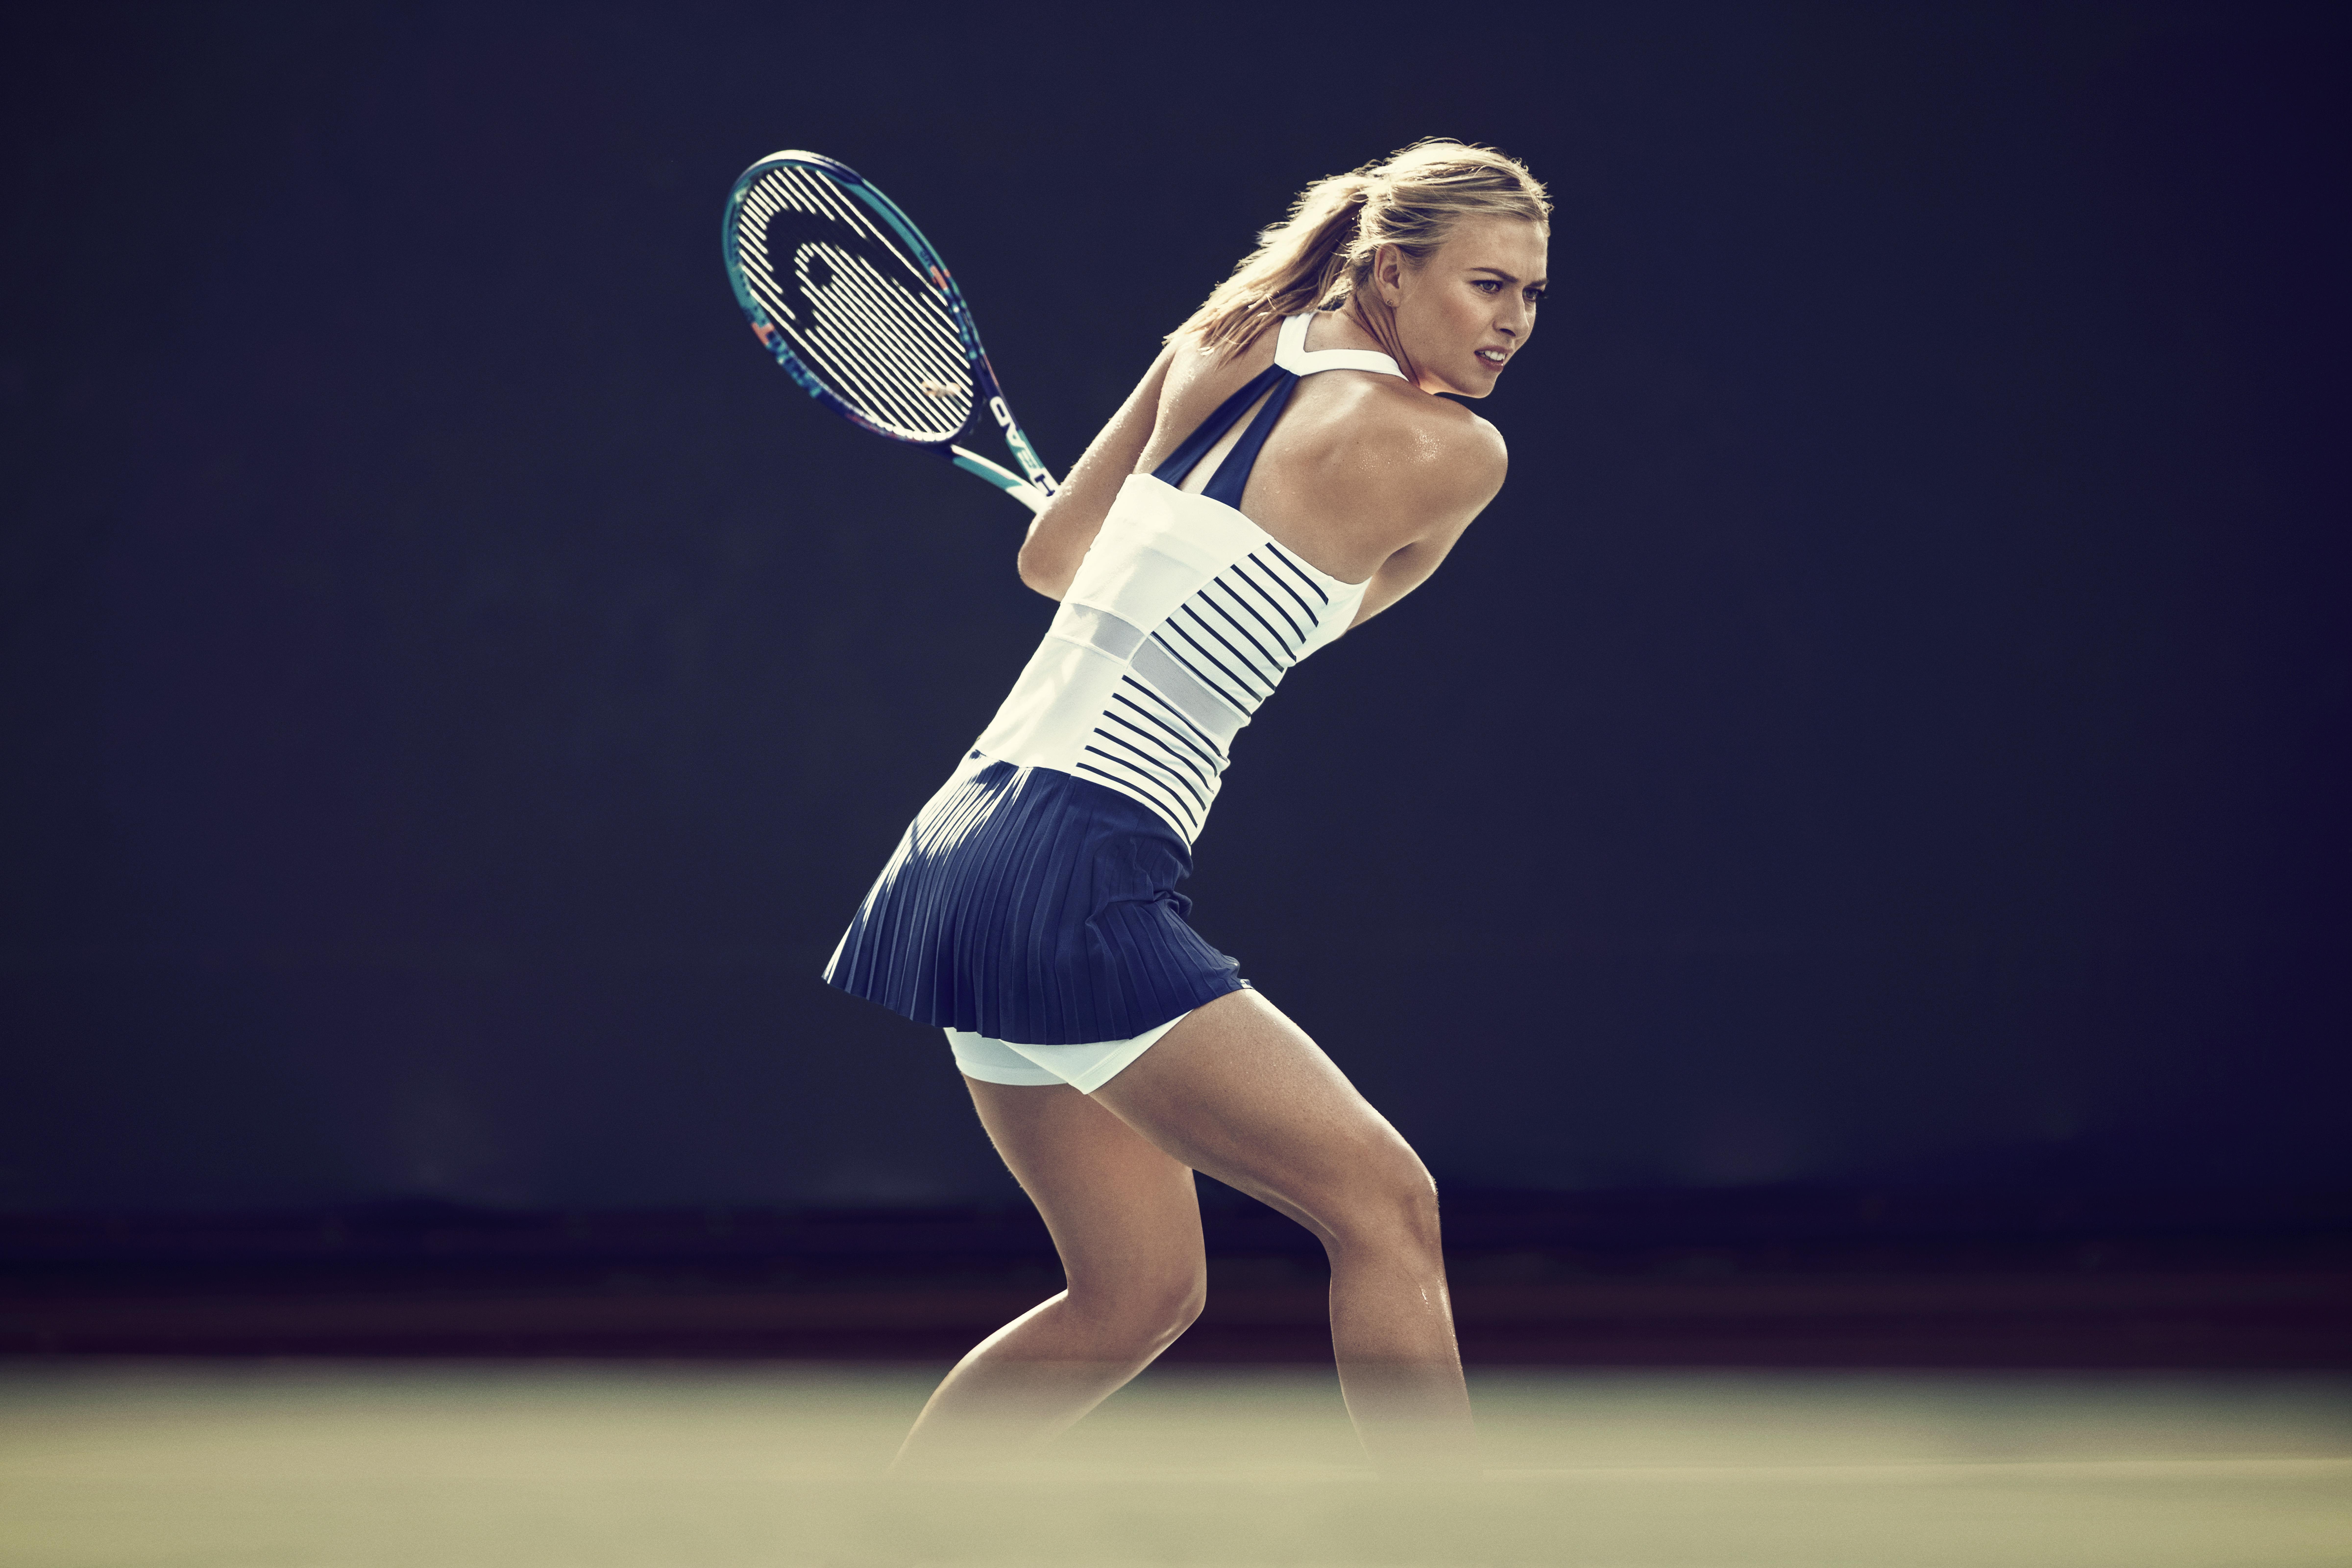 NikeCourt AUSTRALIAN OPEN 2019 Collection | Tennis Connected